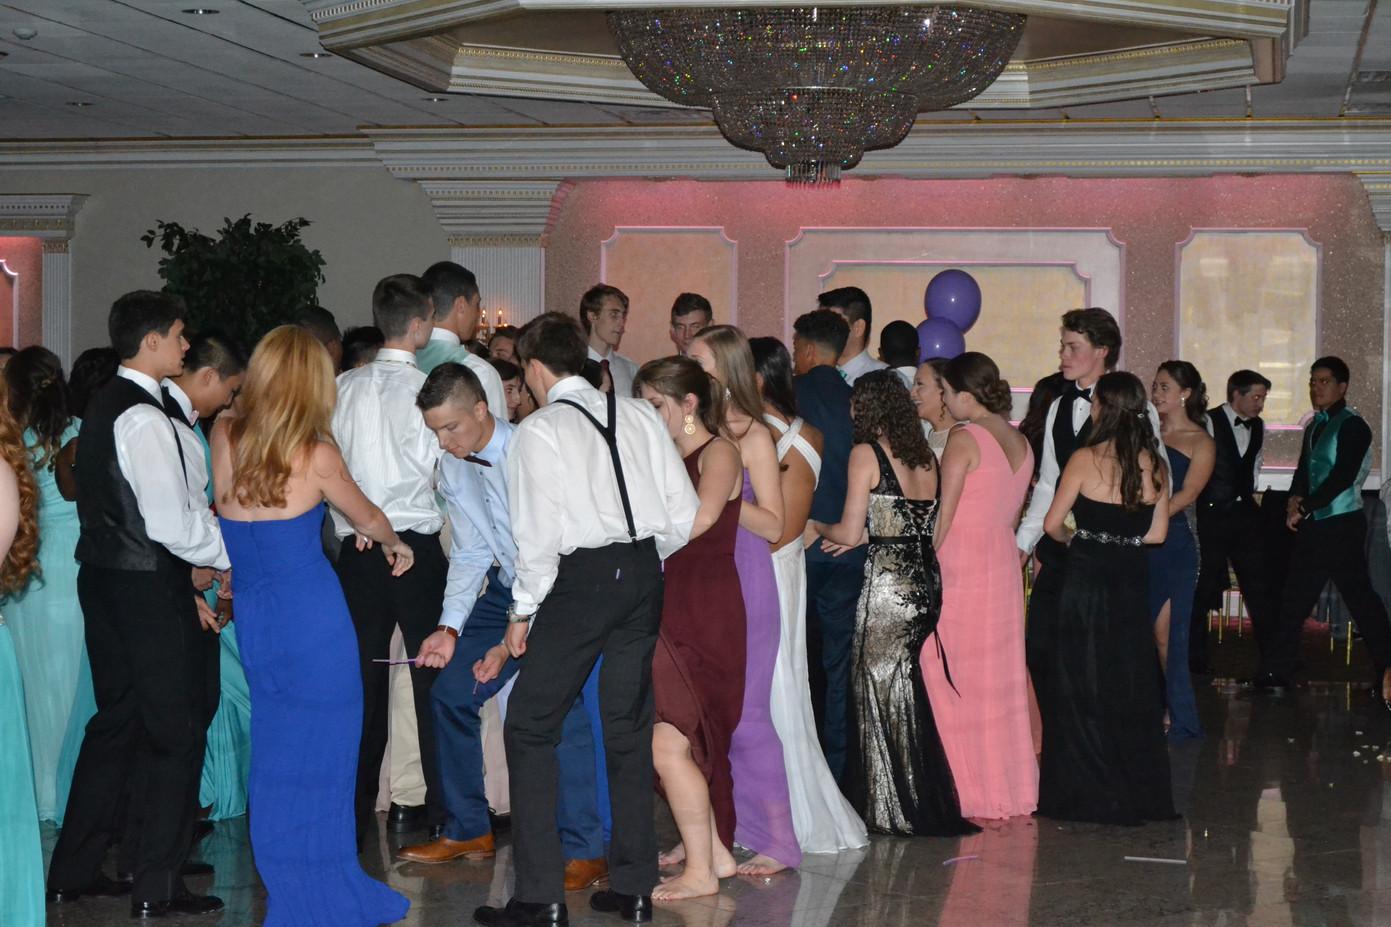 High-School-Prom-Dance-Attendees.JPG